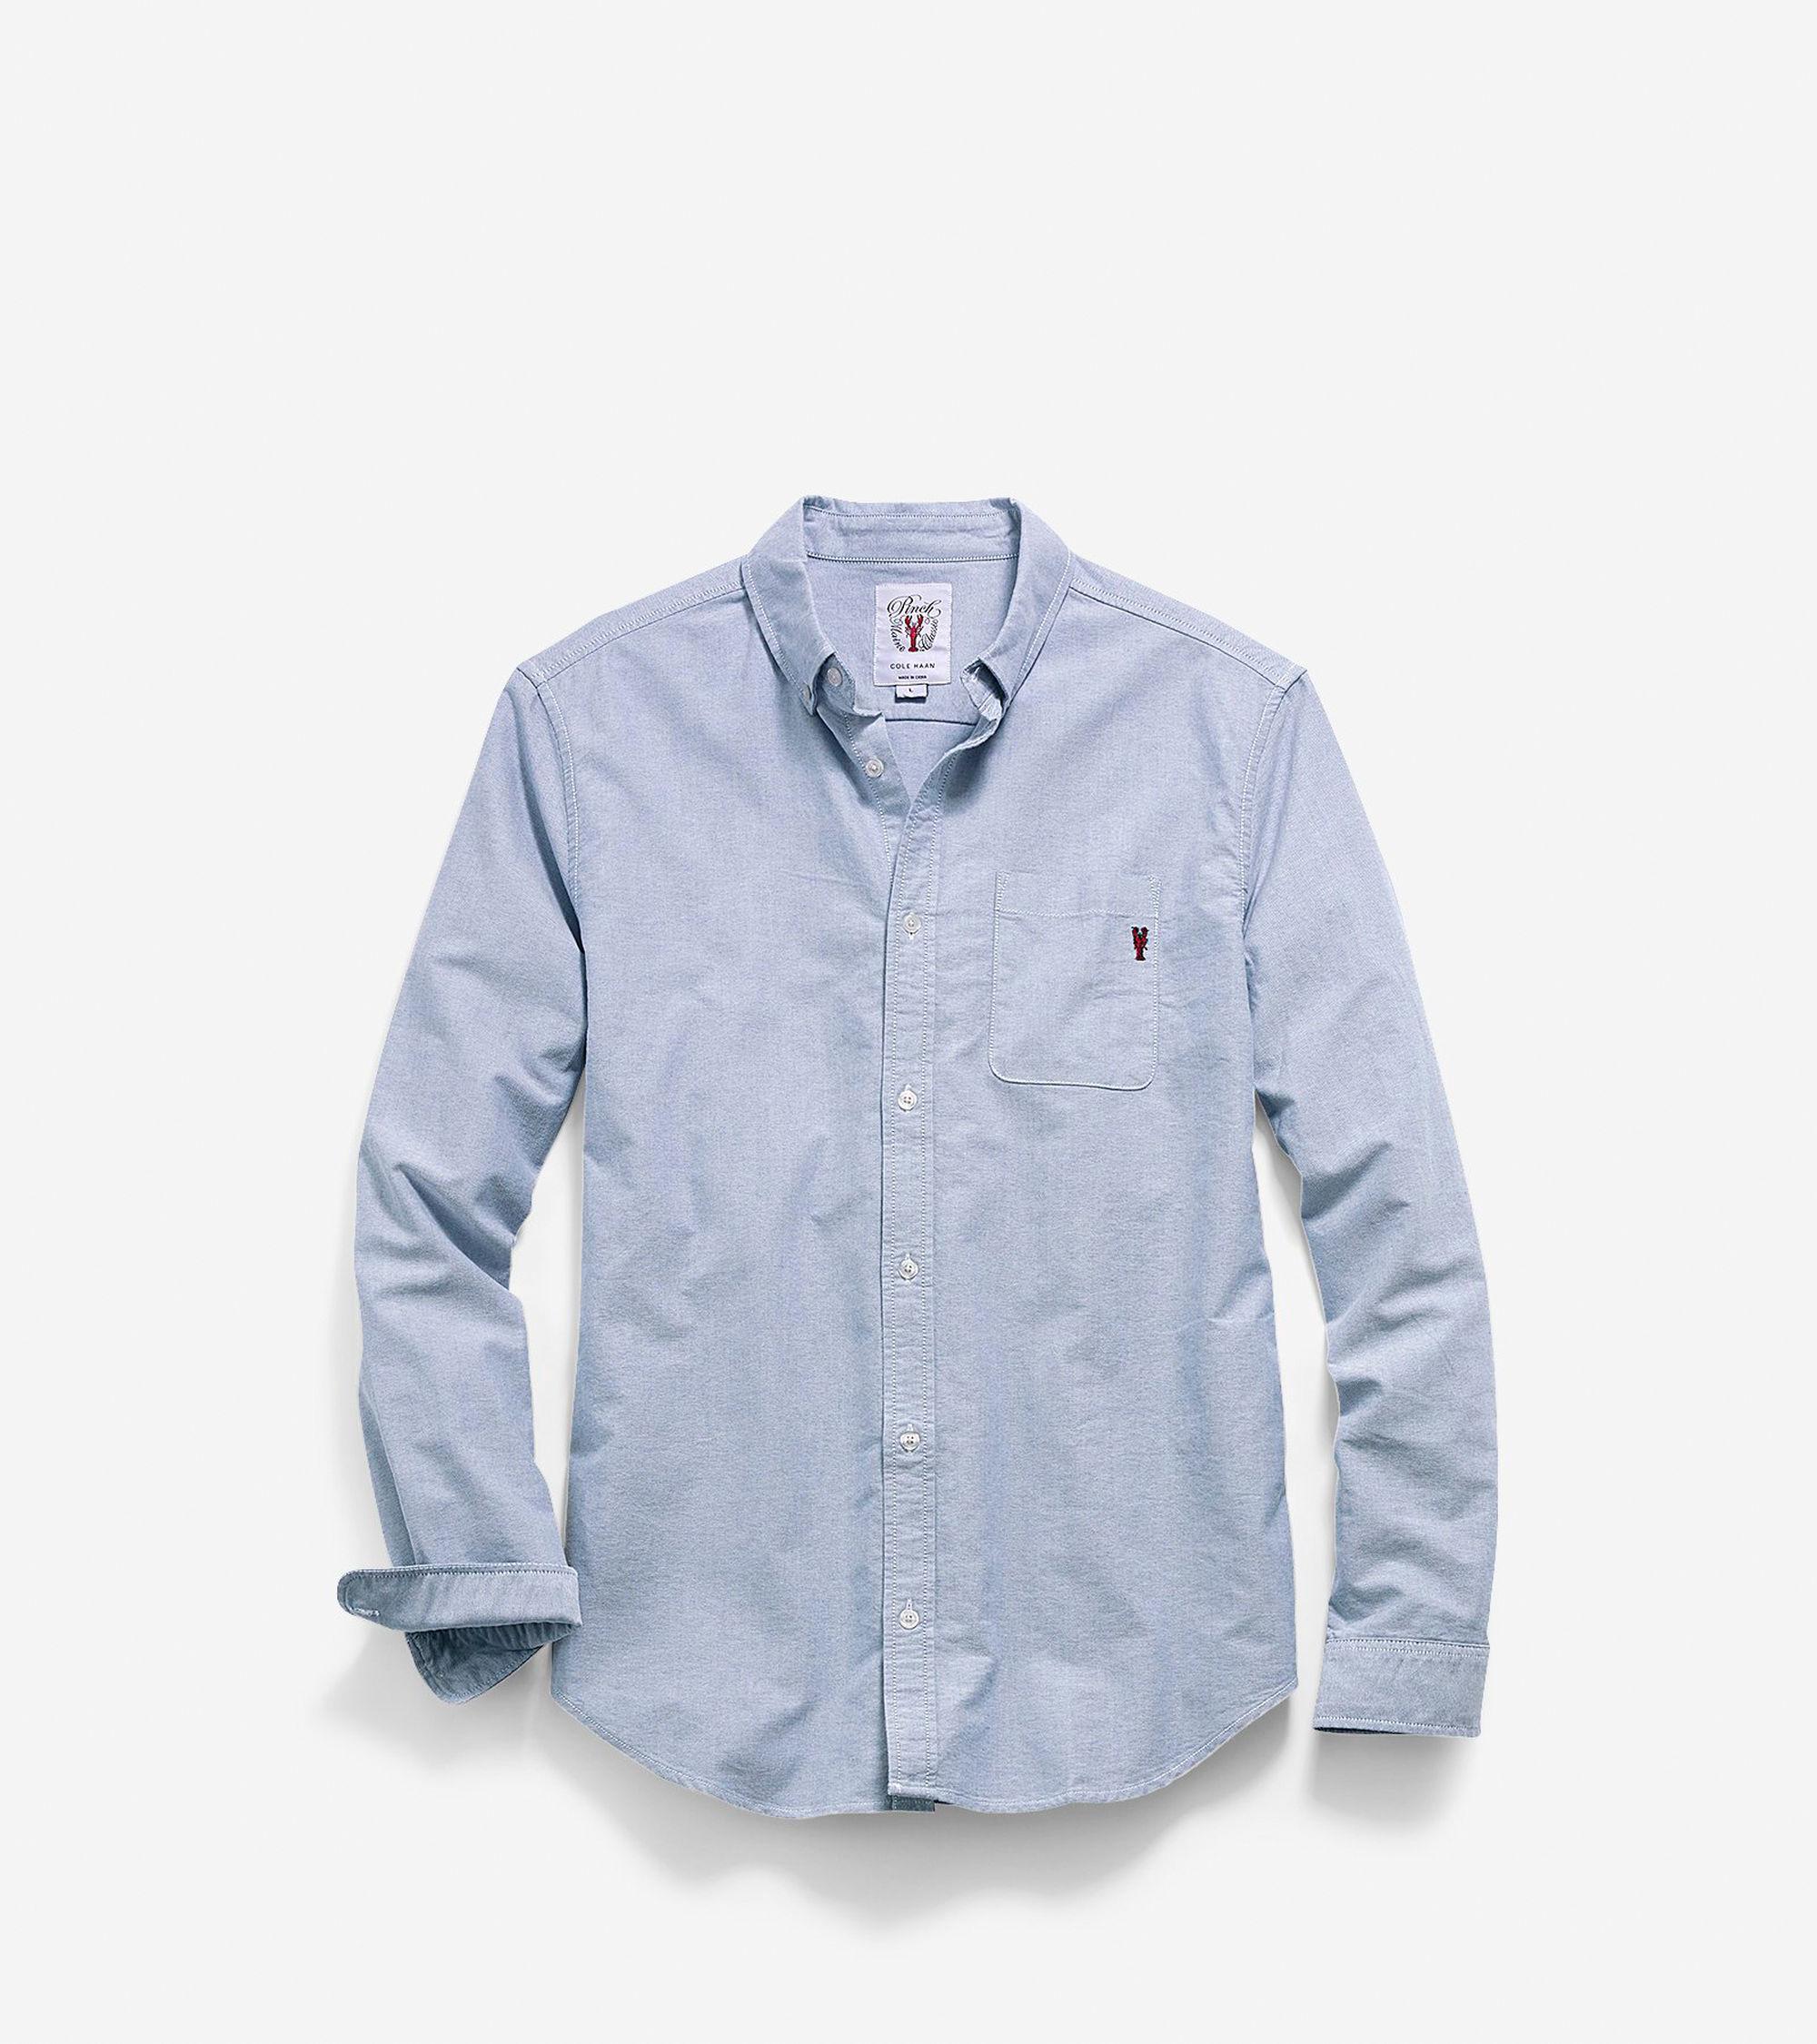 Cole haan Men's Pinch Long Sleeve Oxford Pocket Shirt in Blue for Men (Sky) | Lyst